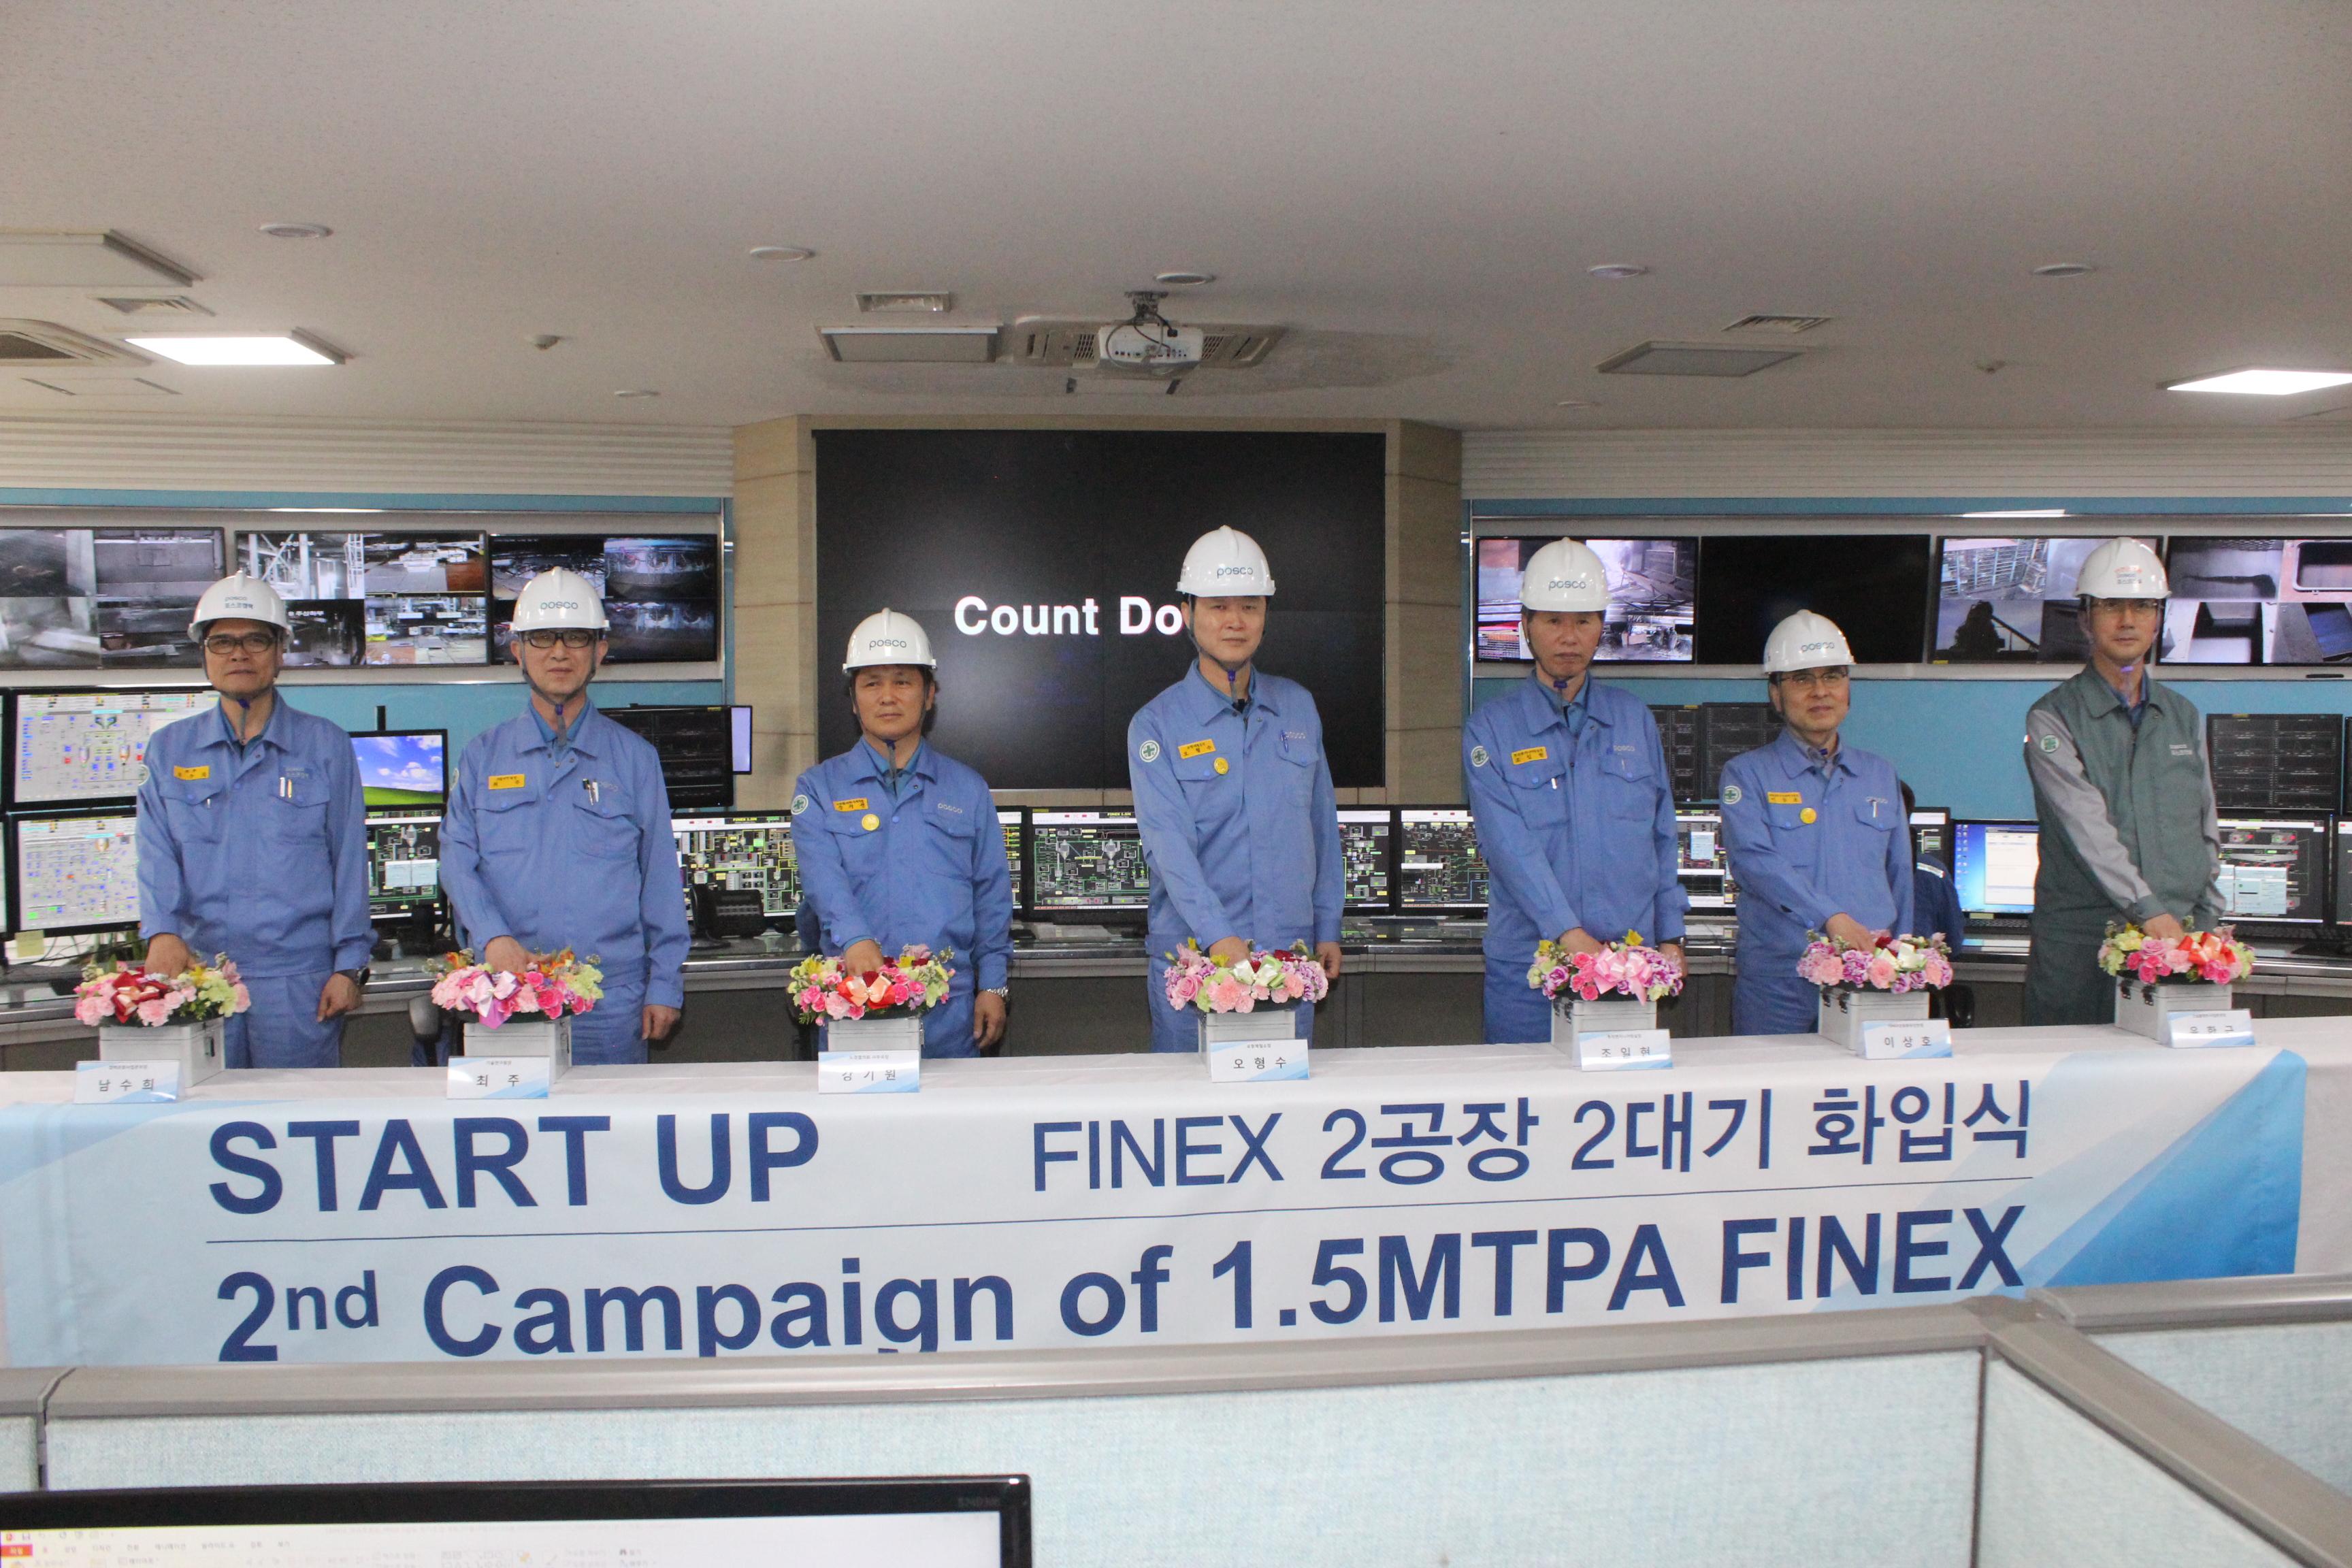 FINEX 2공장 2대기 화입식. START UP 2nd Campaign of 1.5MTPA FINEX.